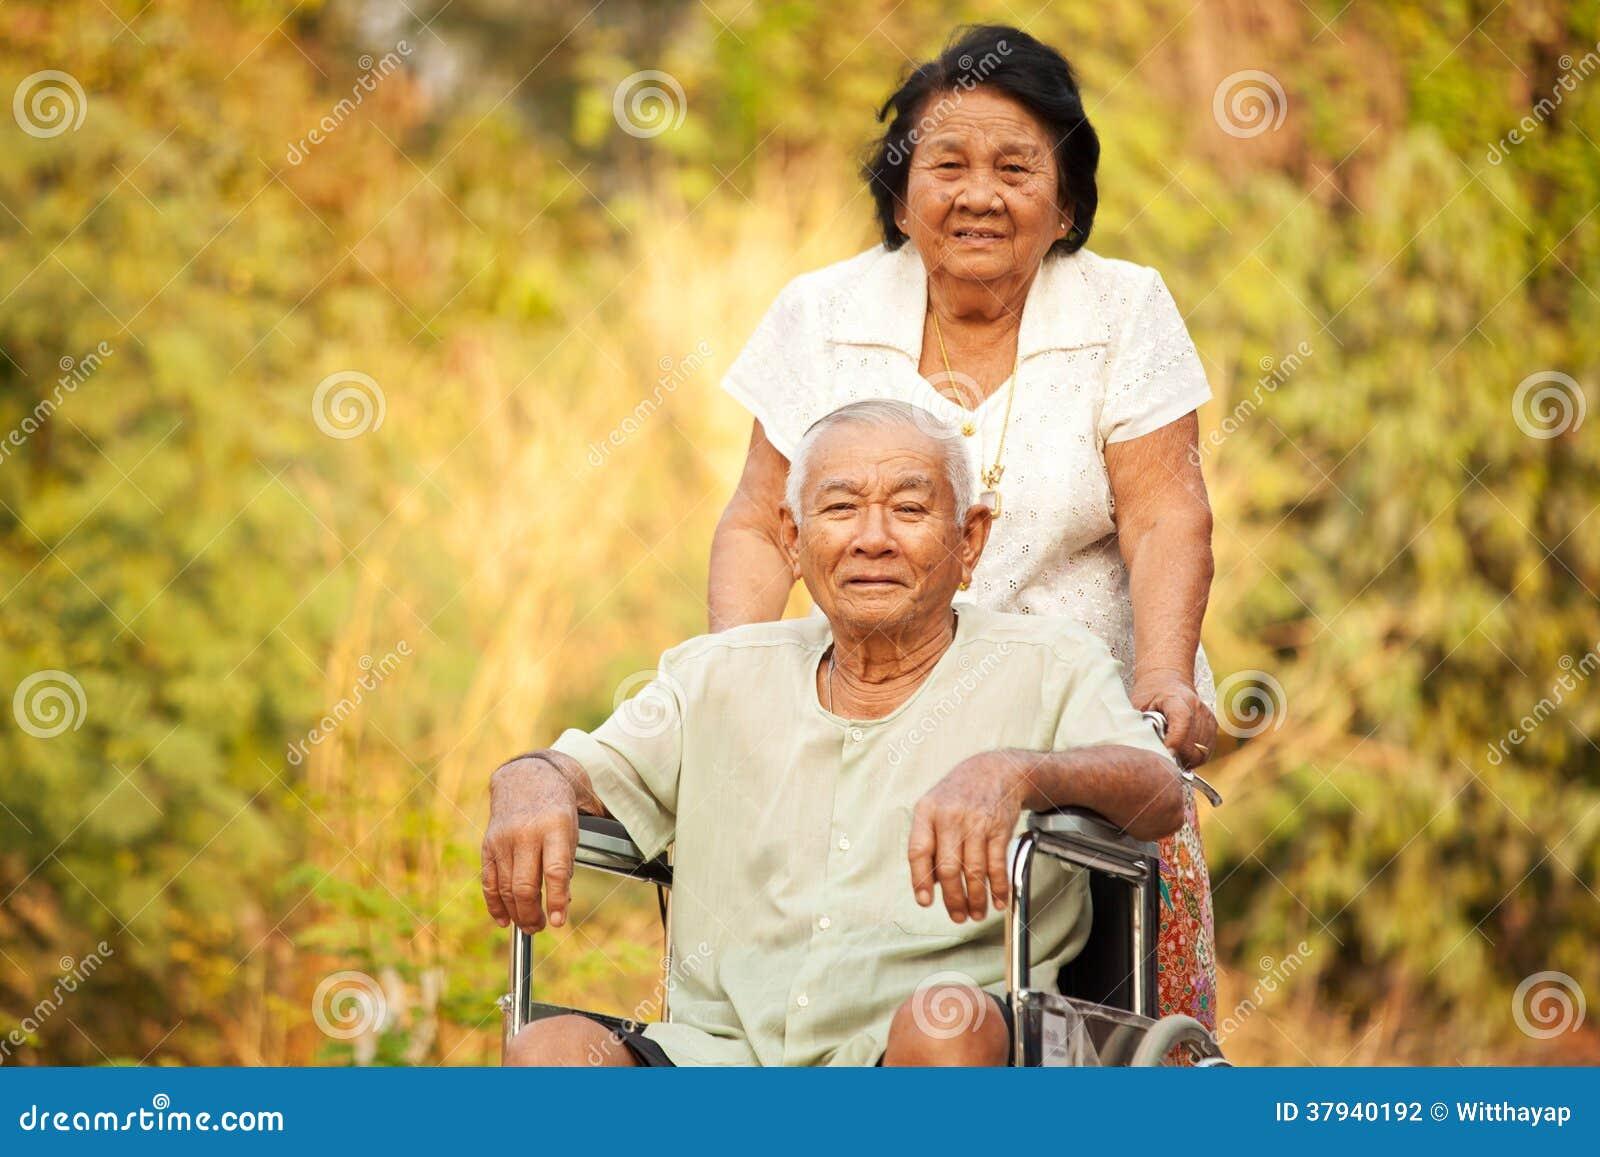 Senior asian dating sites